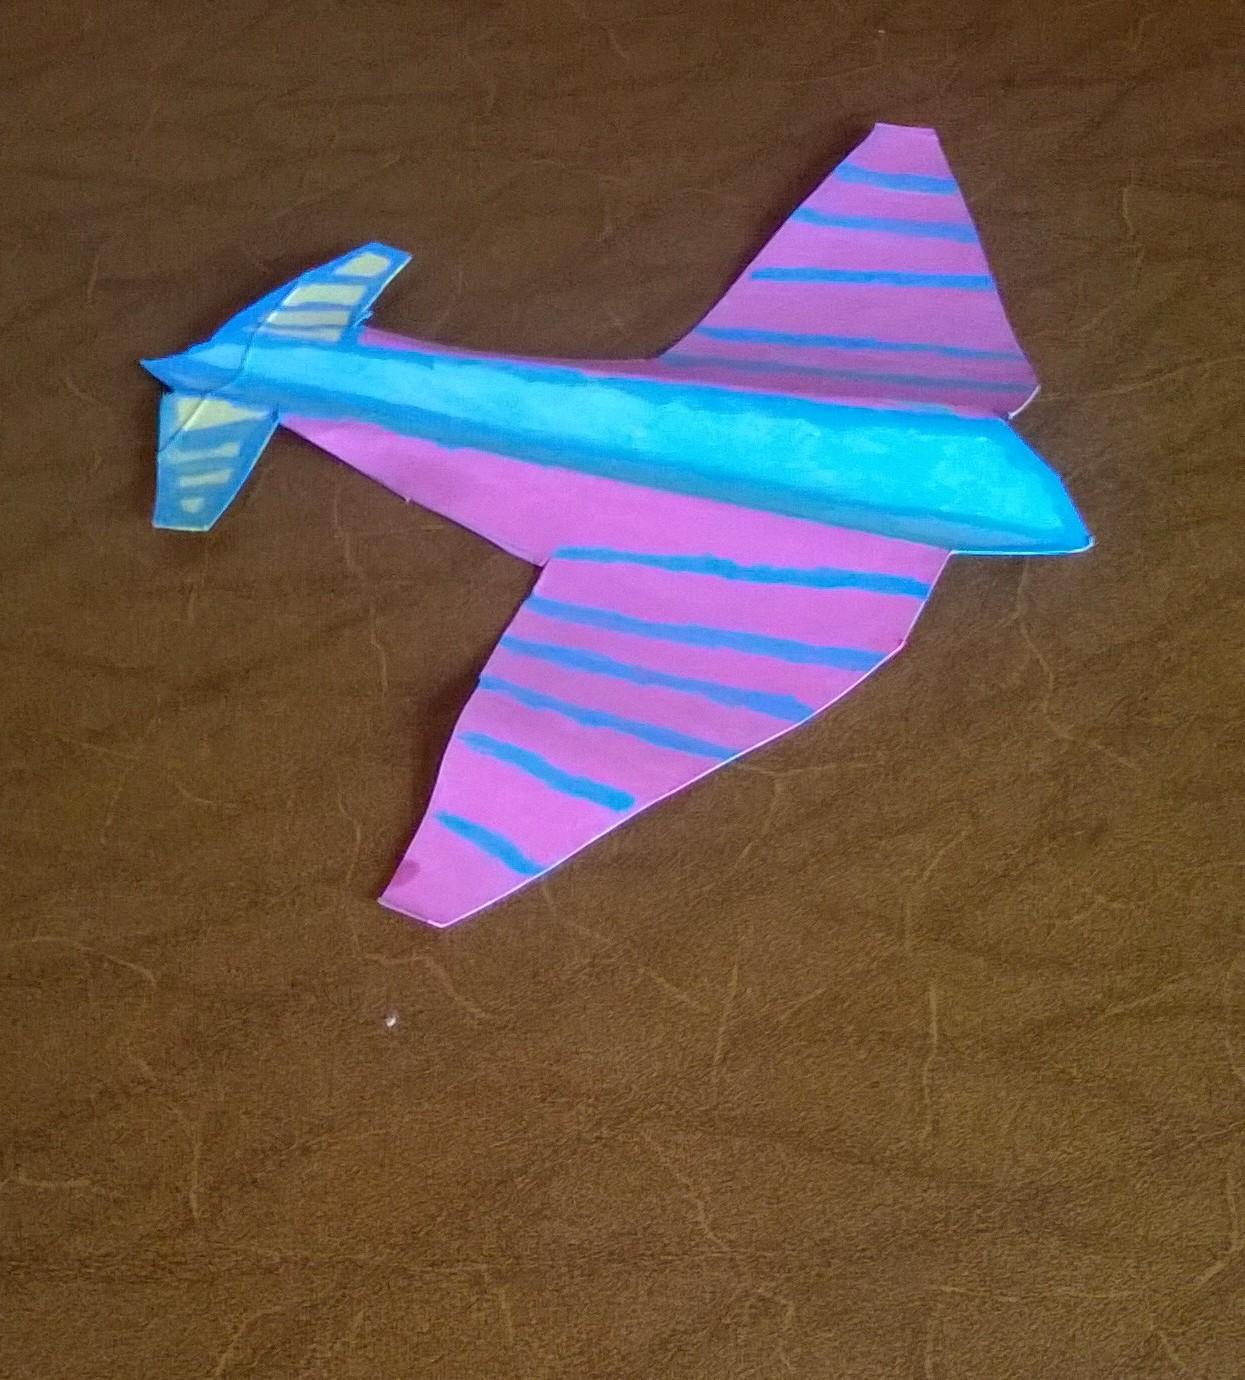 aereo di cartone